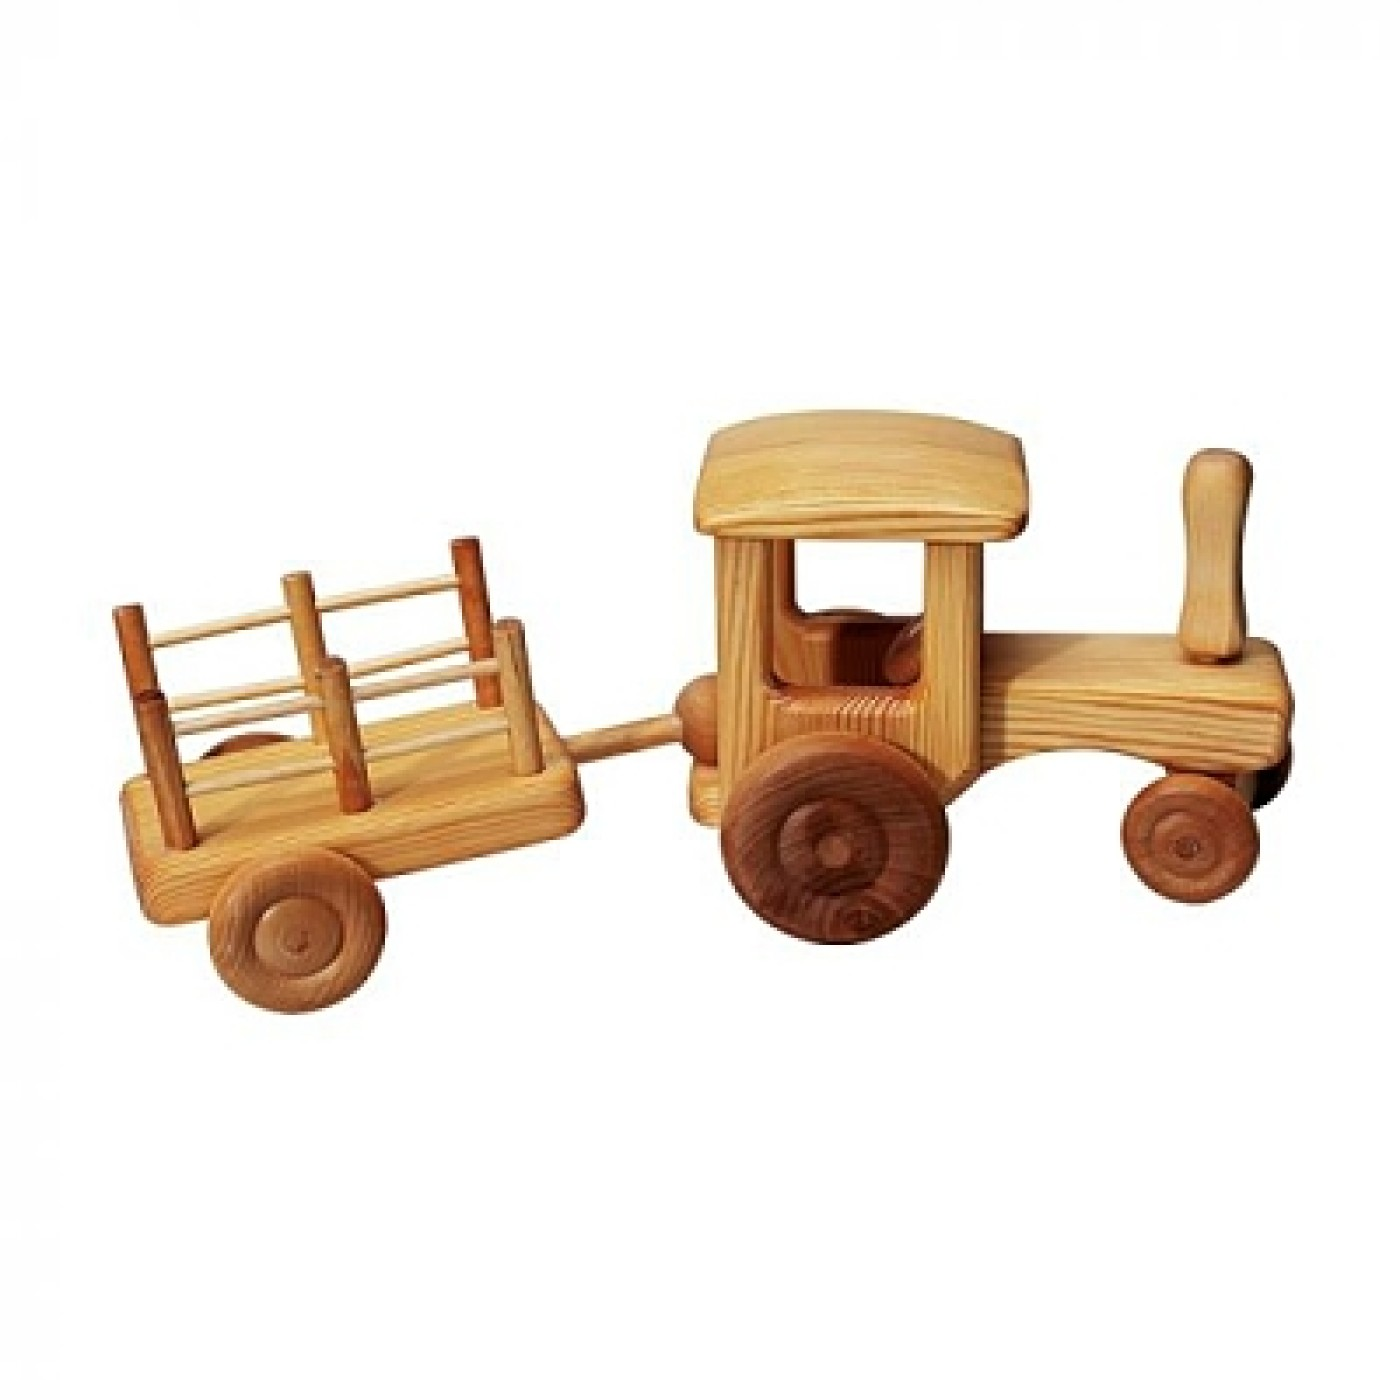 Debresk Wooden Toy Tractor w/ Trailer